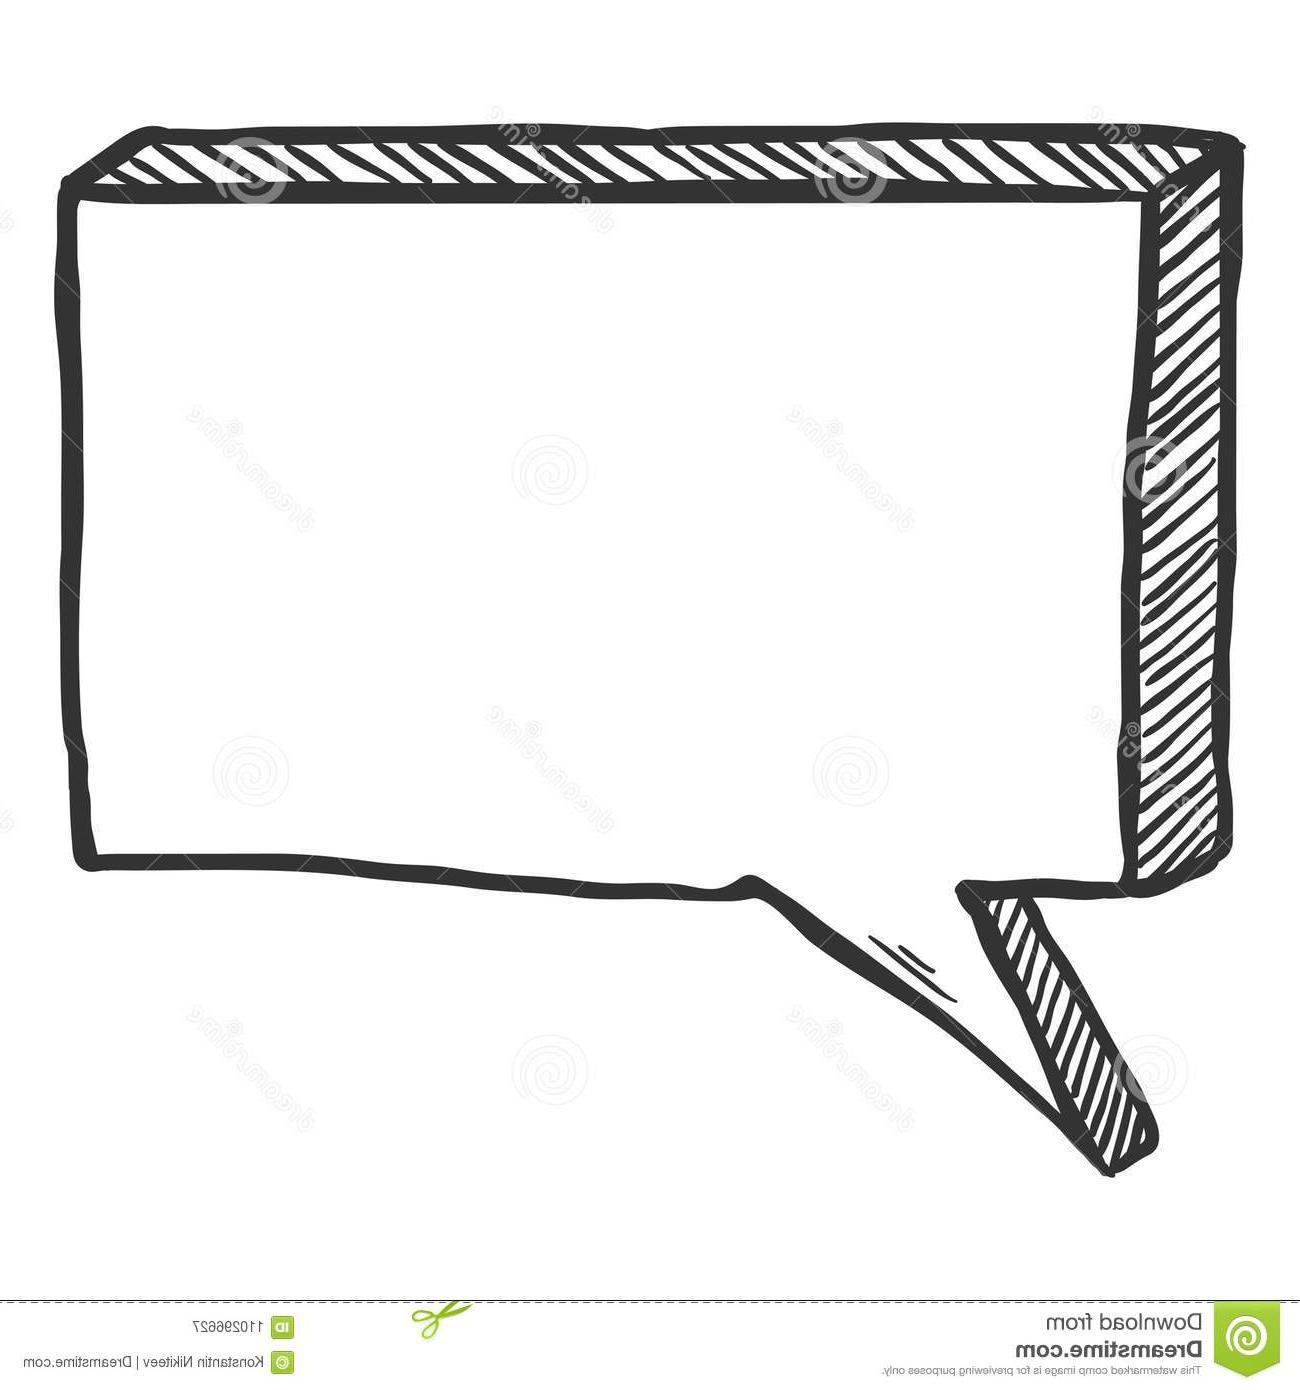 Clipart stock quote clipart Best Rectangular Quote Bubble Clip Art Images » Vector Images Design clipart